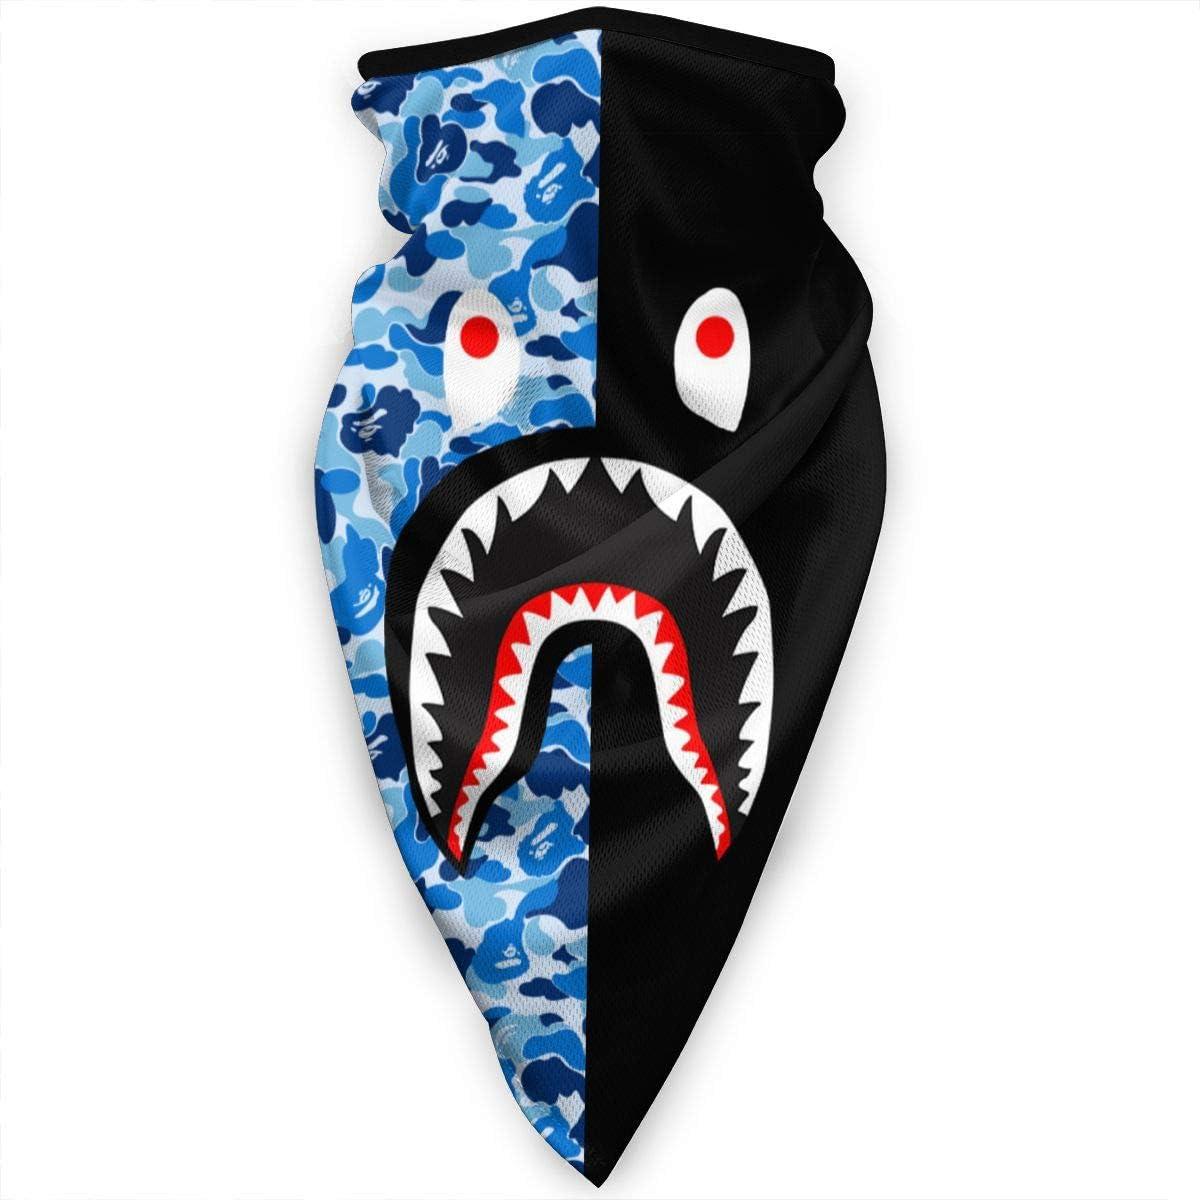 Bape Blood Shark Neck Gaiter Balaclava Headband Scarf Bandanas Outdoor